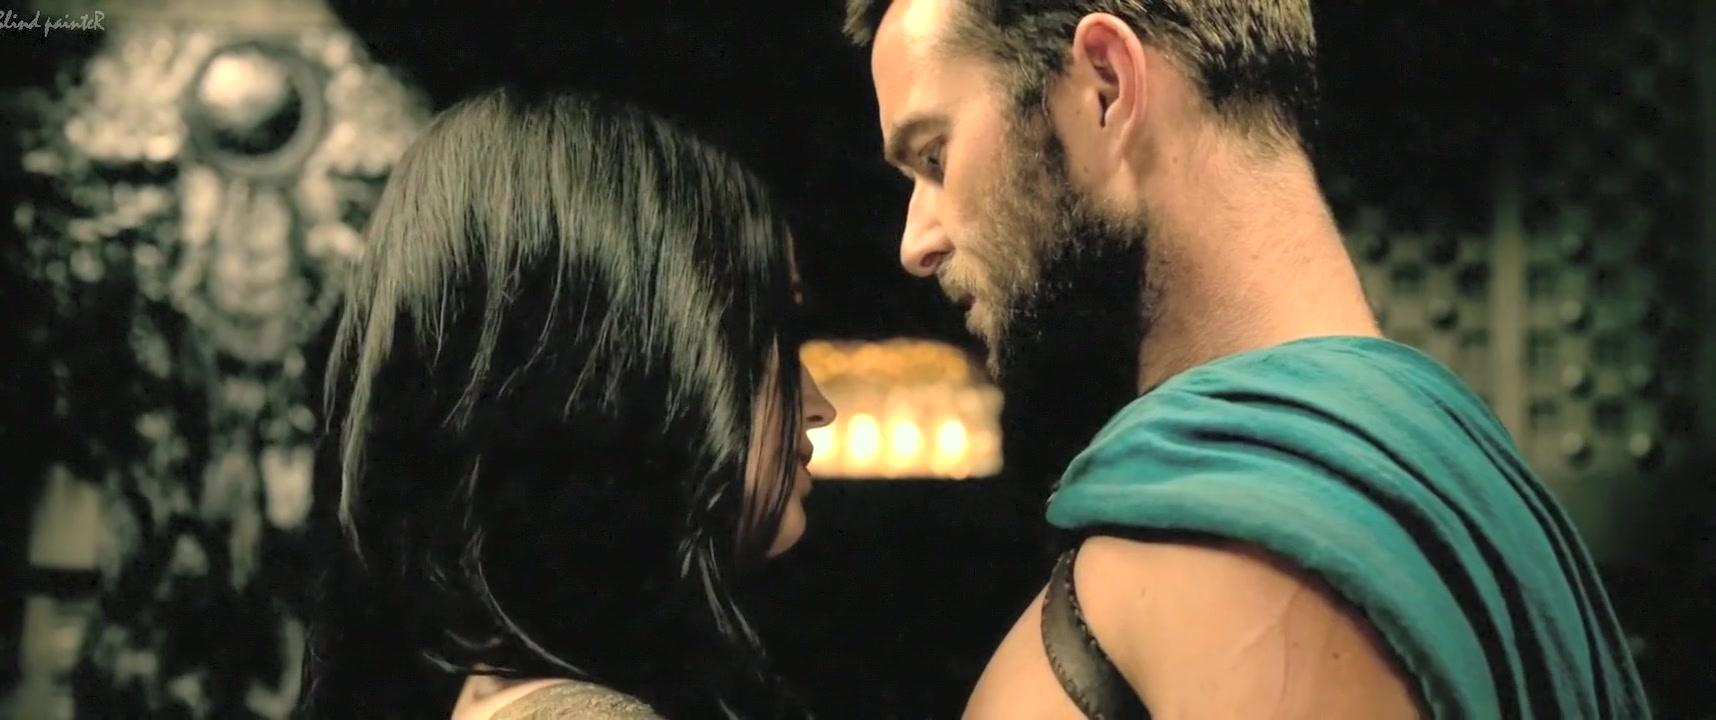 Sexy xXx Base pix Briget marquardt strip tease video